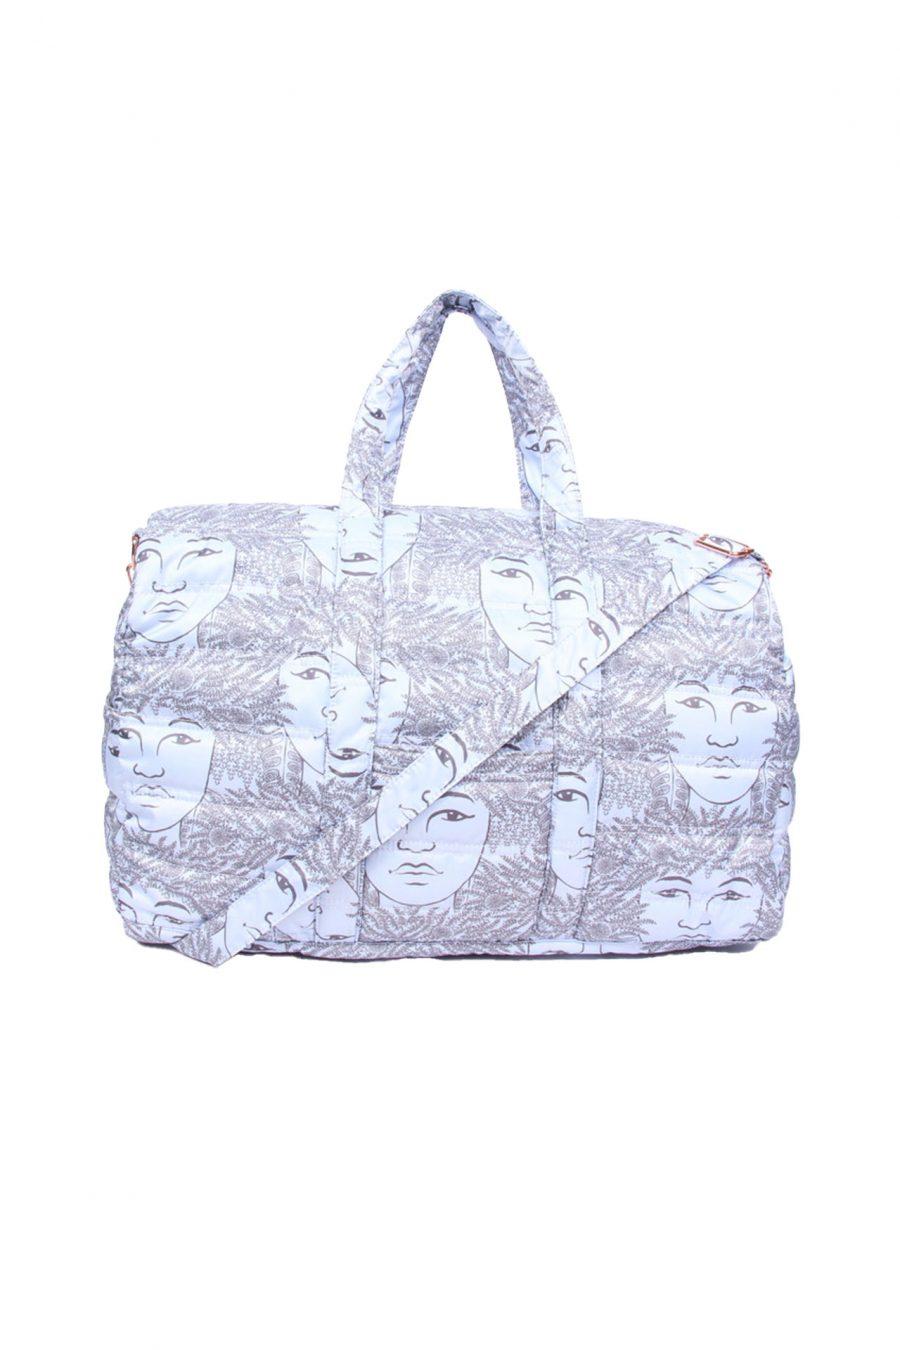 Laulea bag in Laukapalili Pattern